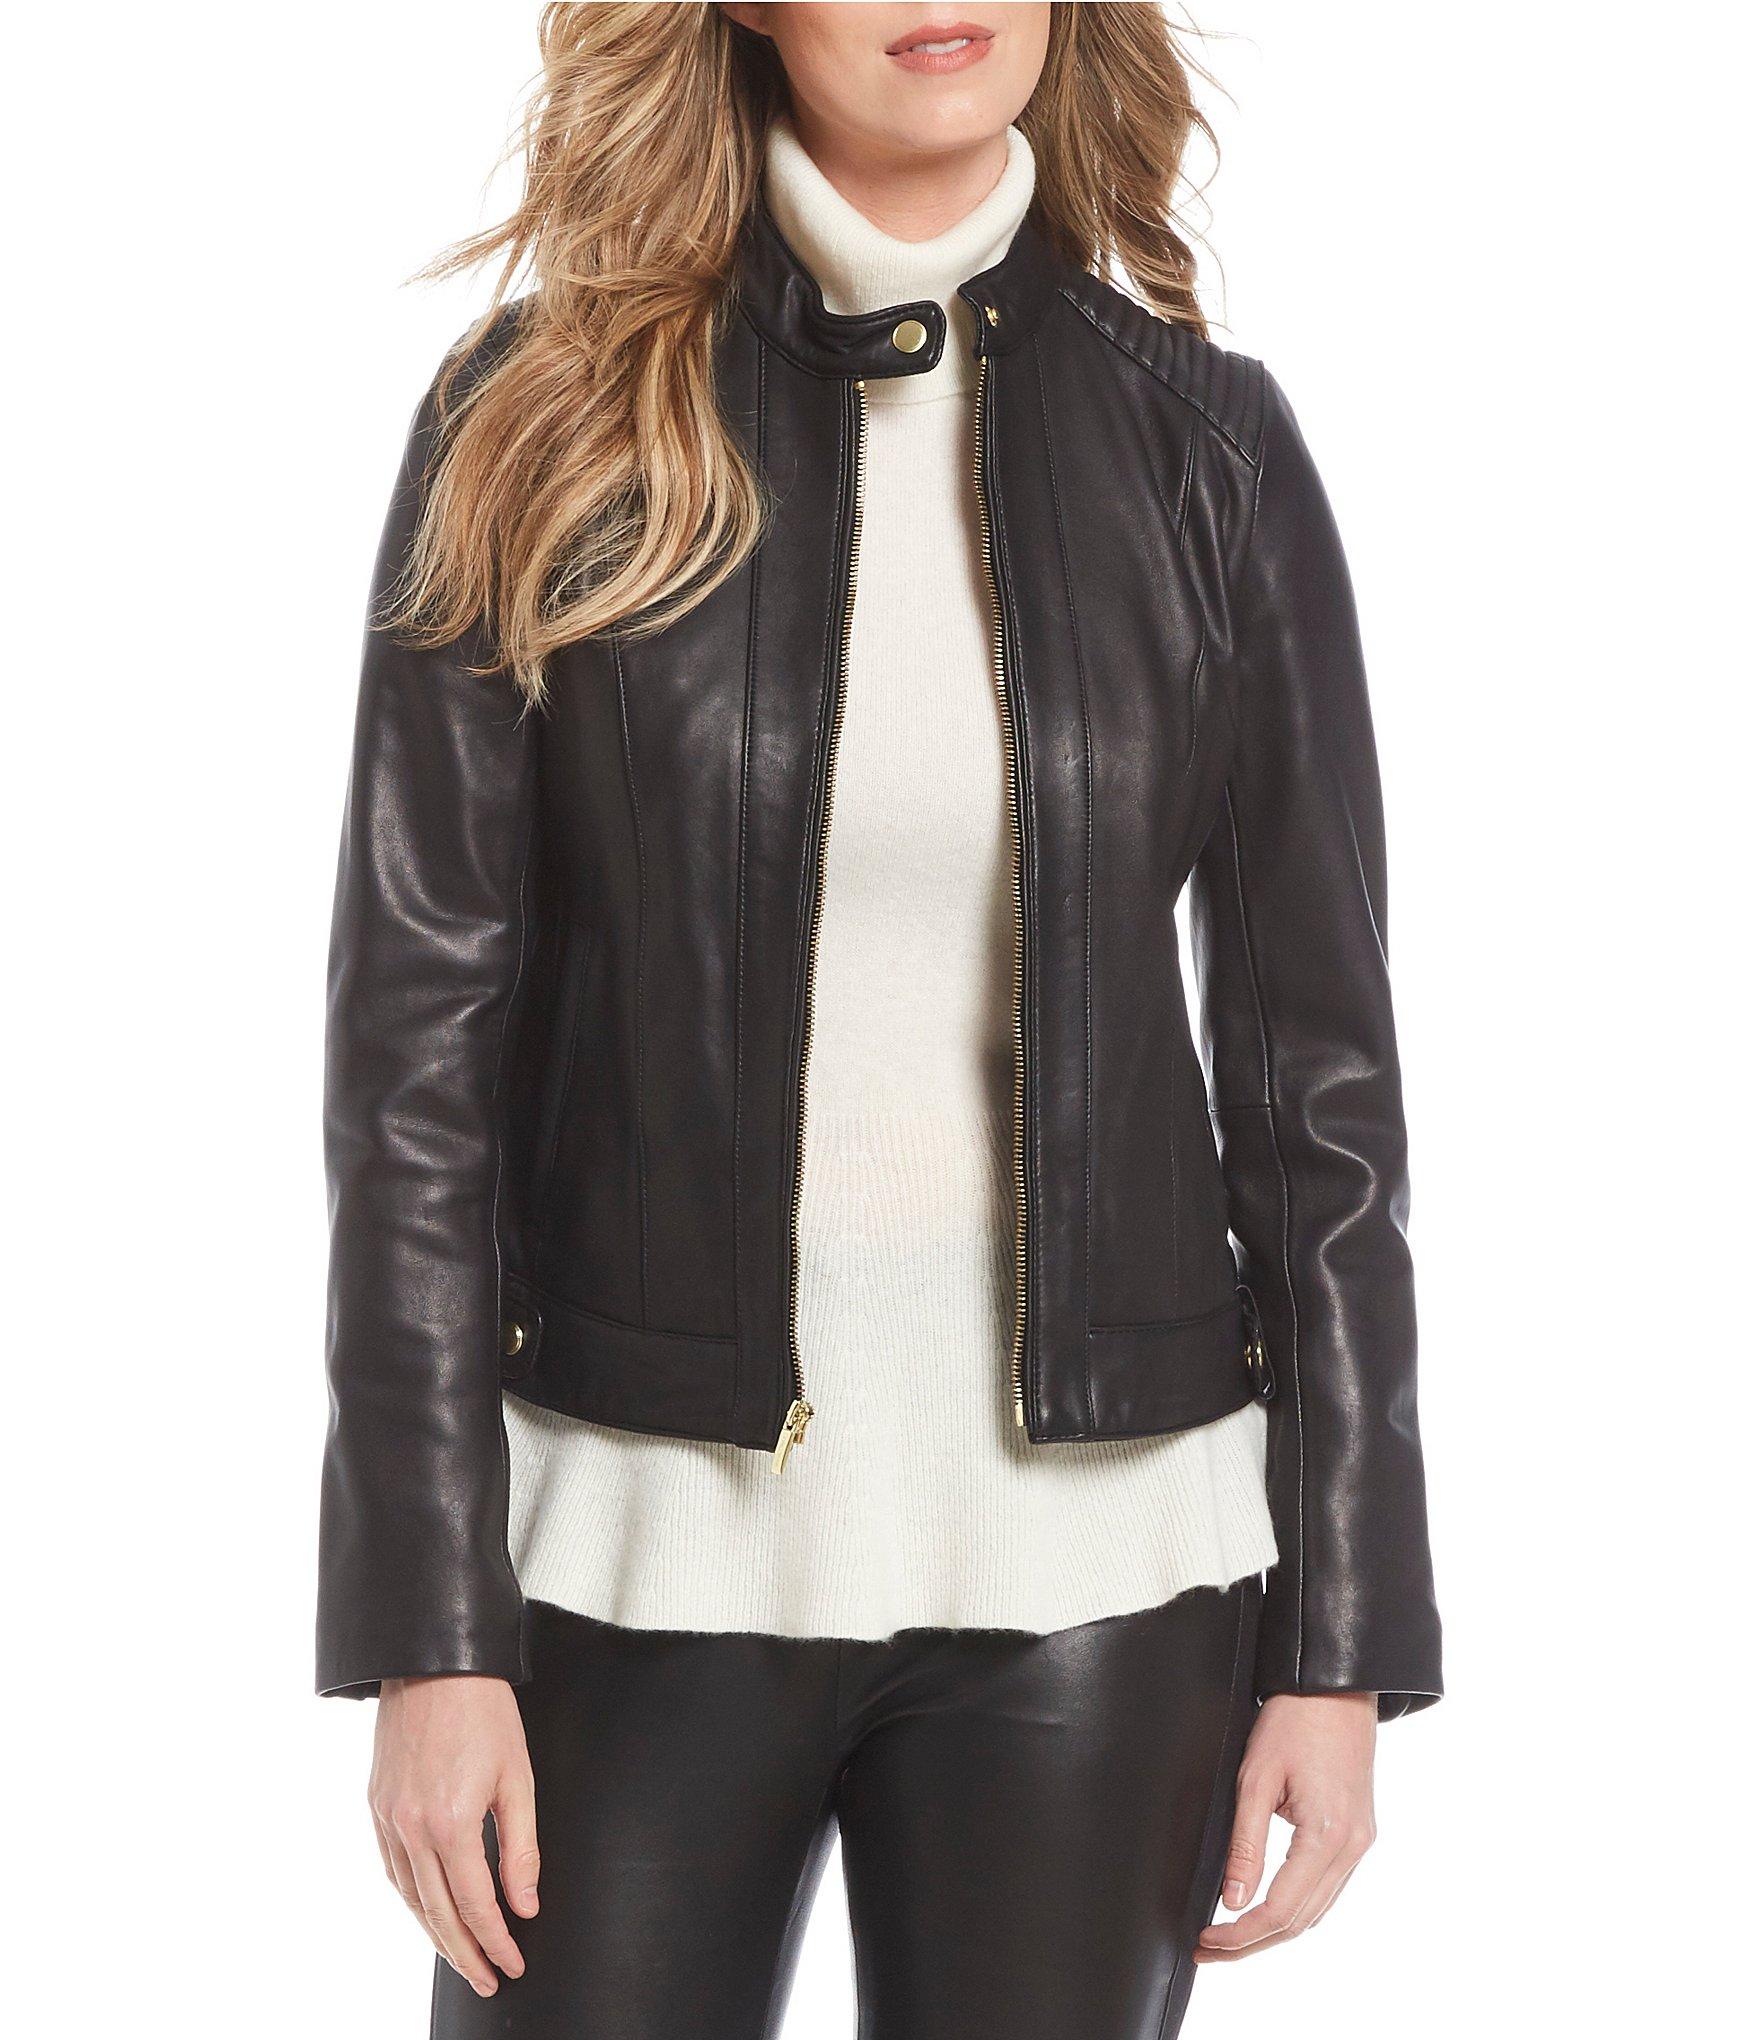 Dillards womens leather jackets